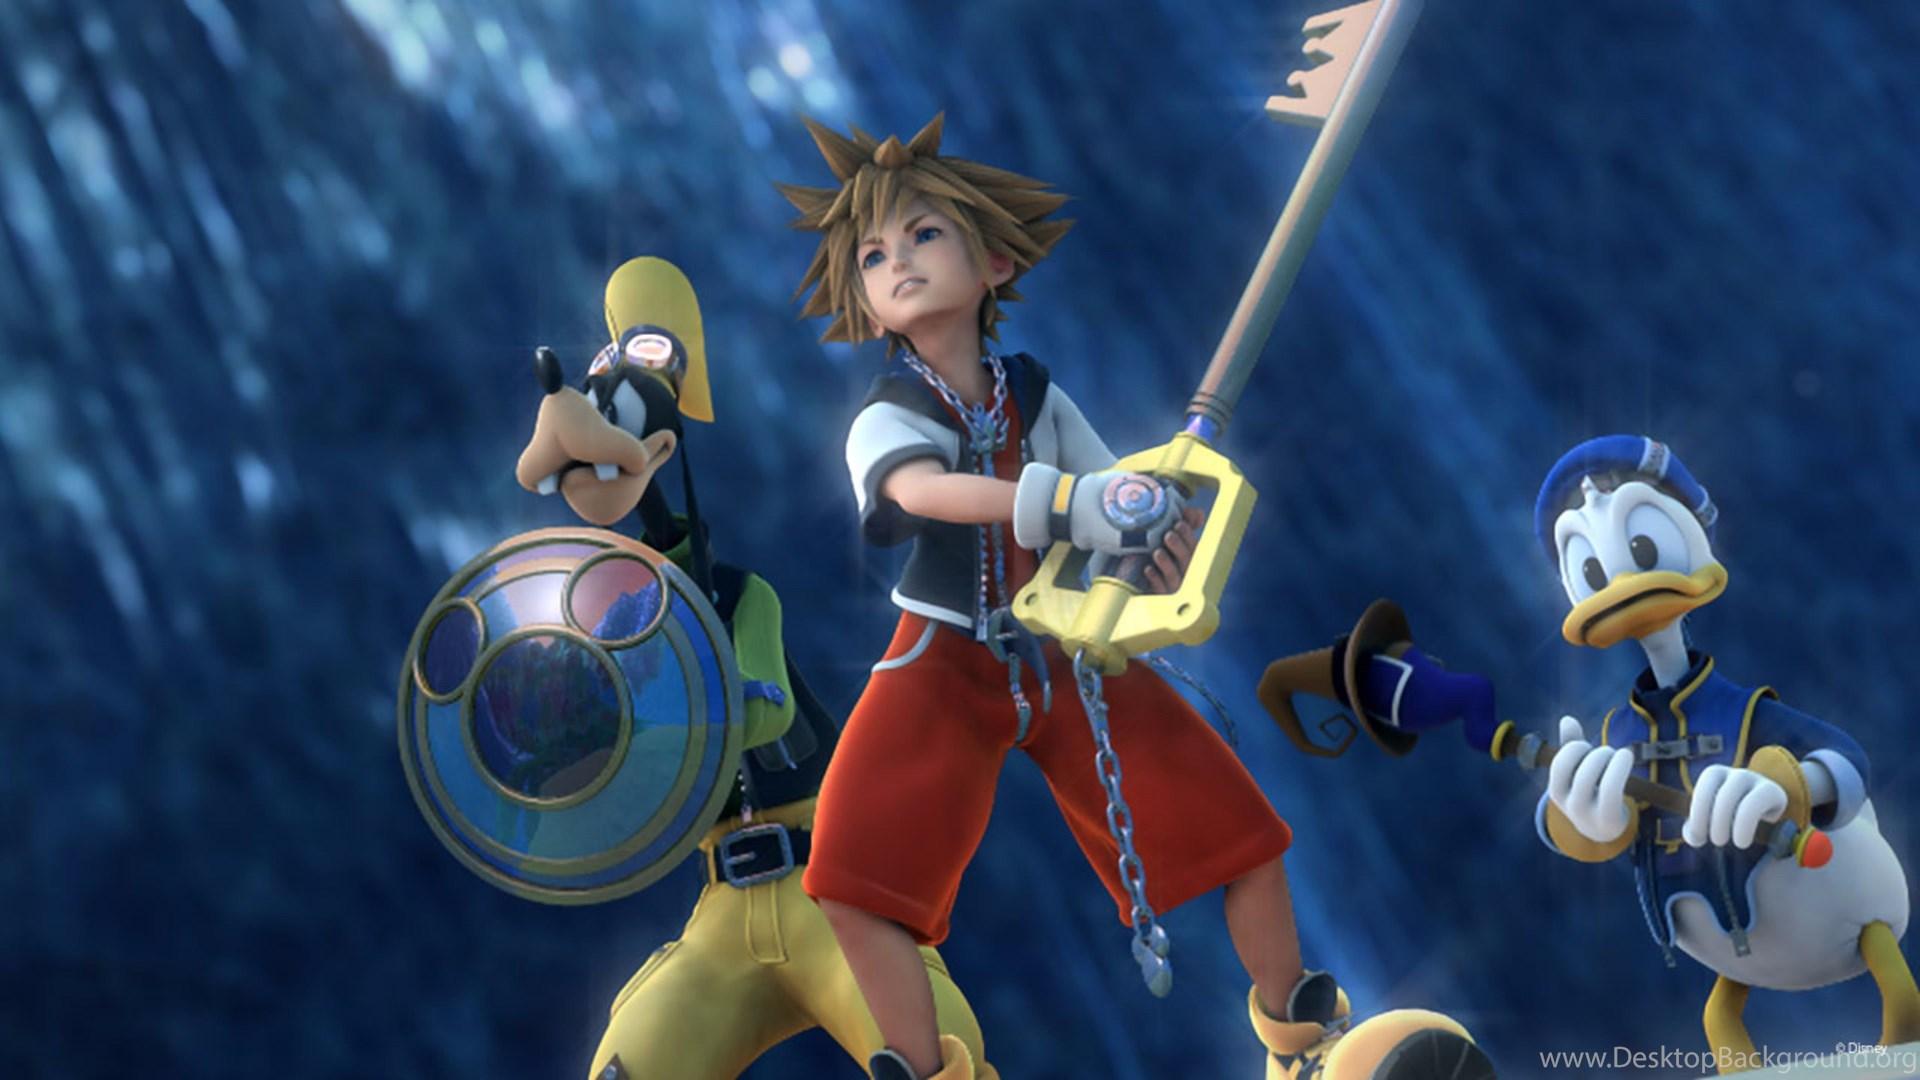 Download Free 2016 Kingdom Hearts 3 4k Wallpapers Desktop Background